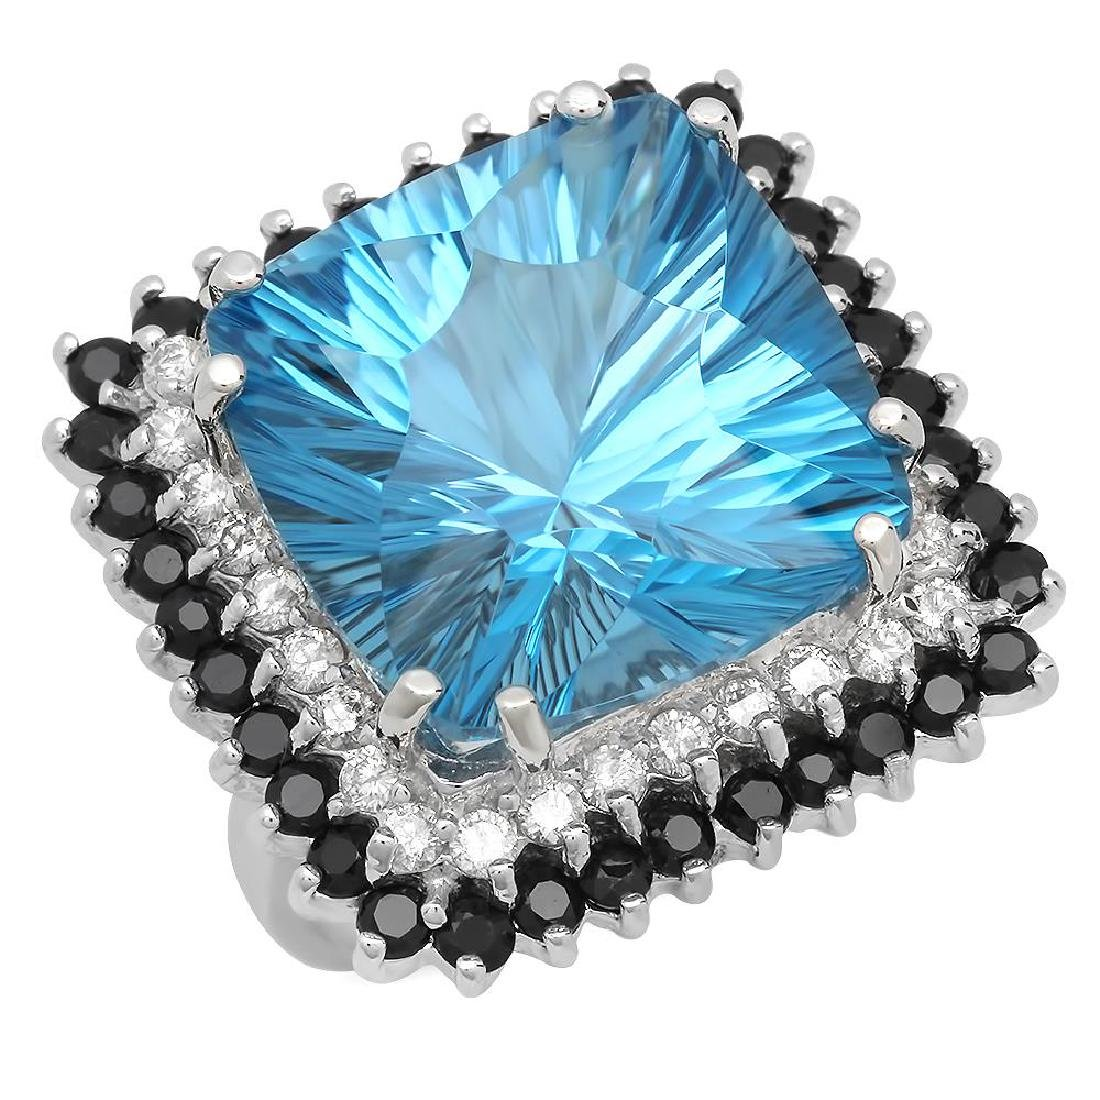 14K Gold 20.53ct Topaz 1.65ct Sapphire 0.77ct Diamond